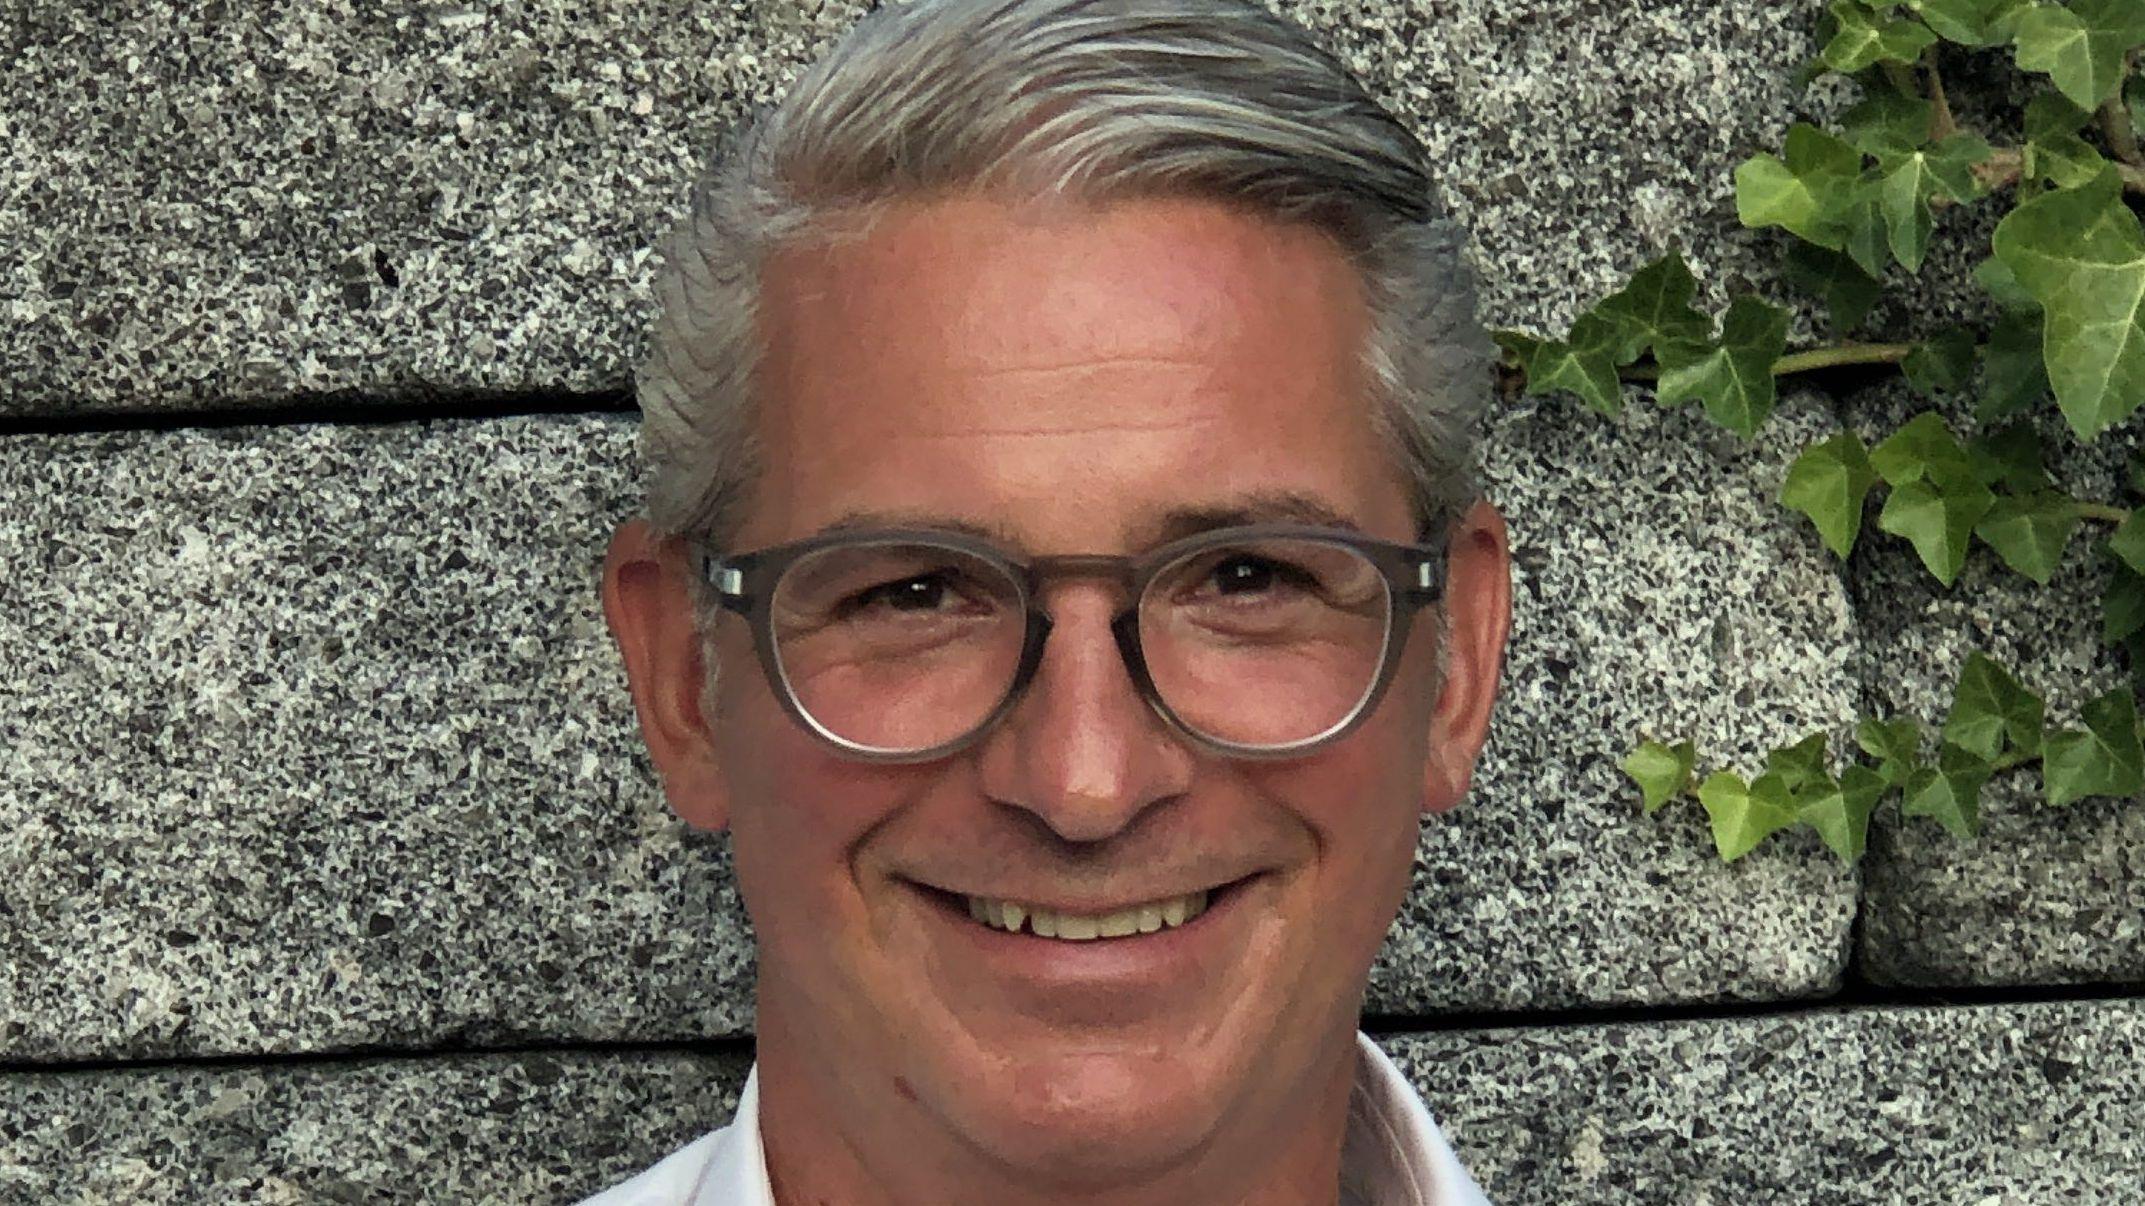 Langjähriger Dockers Vertriebschef wechselt zu Hamm Market